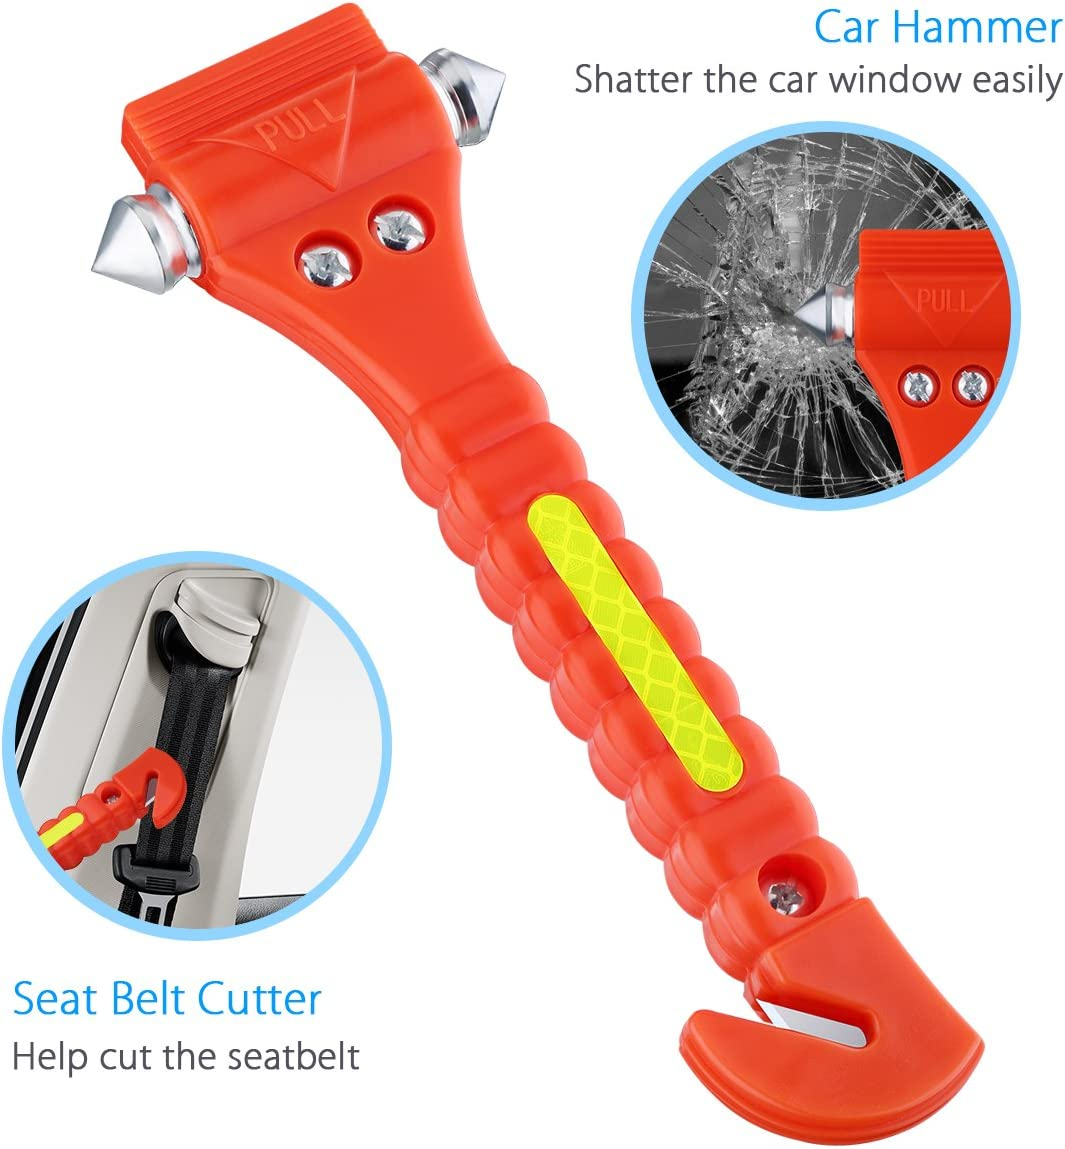 STA Car Emergency Tool,Hardened Steel Car Window Breaker Hammer,Personal Safety Tool,Quick Response Emergency Tool,Self Defence Tool Seat Belt Cutter Black